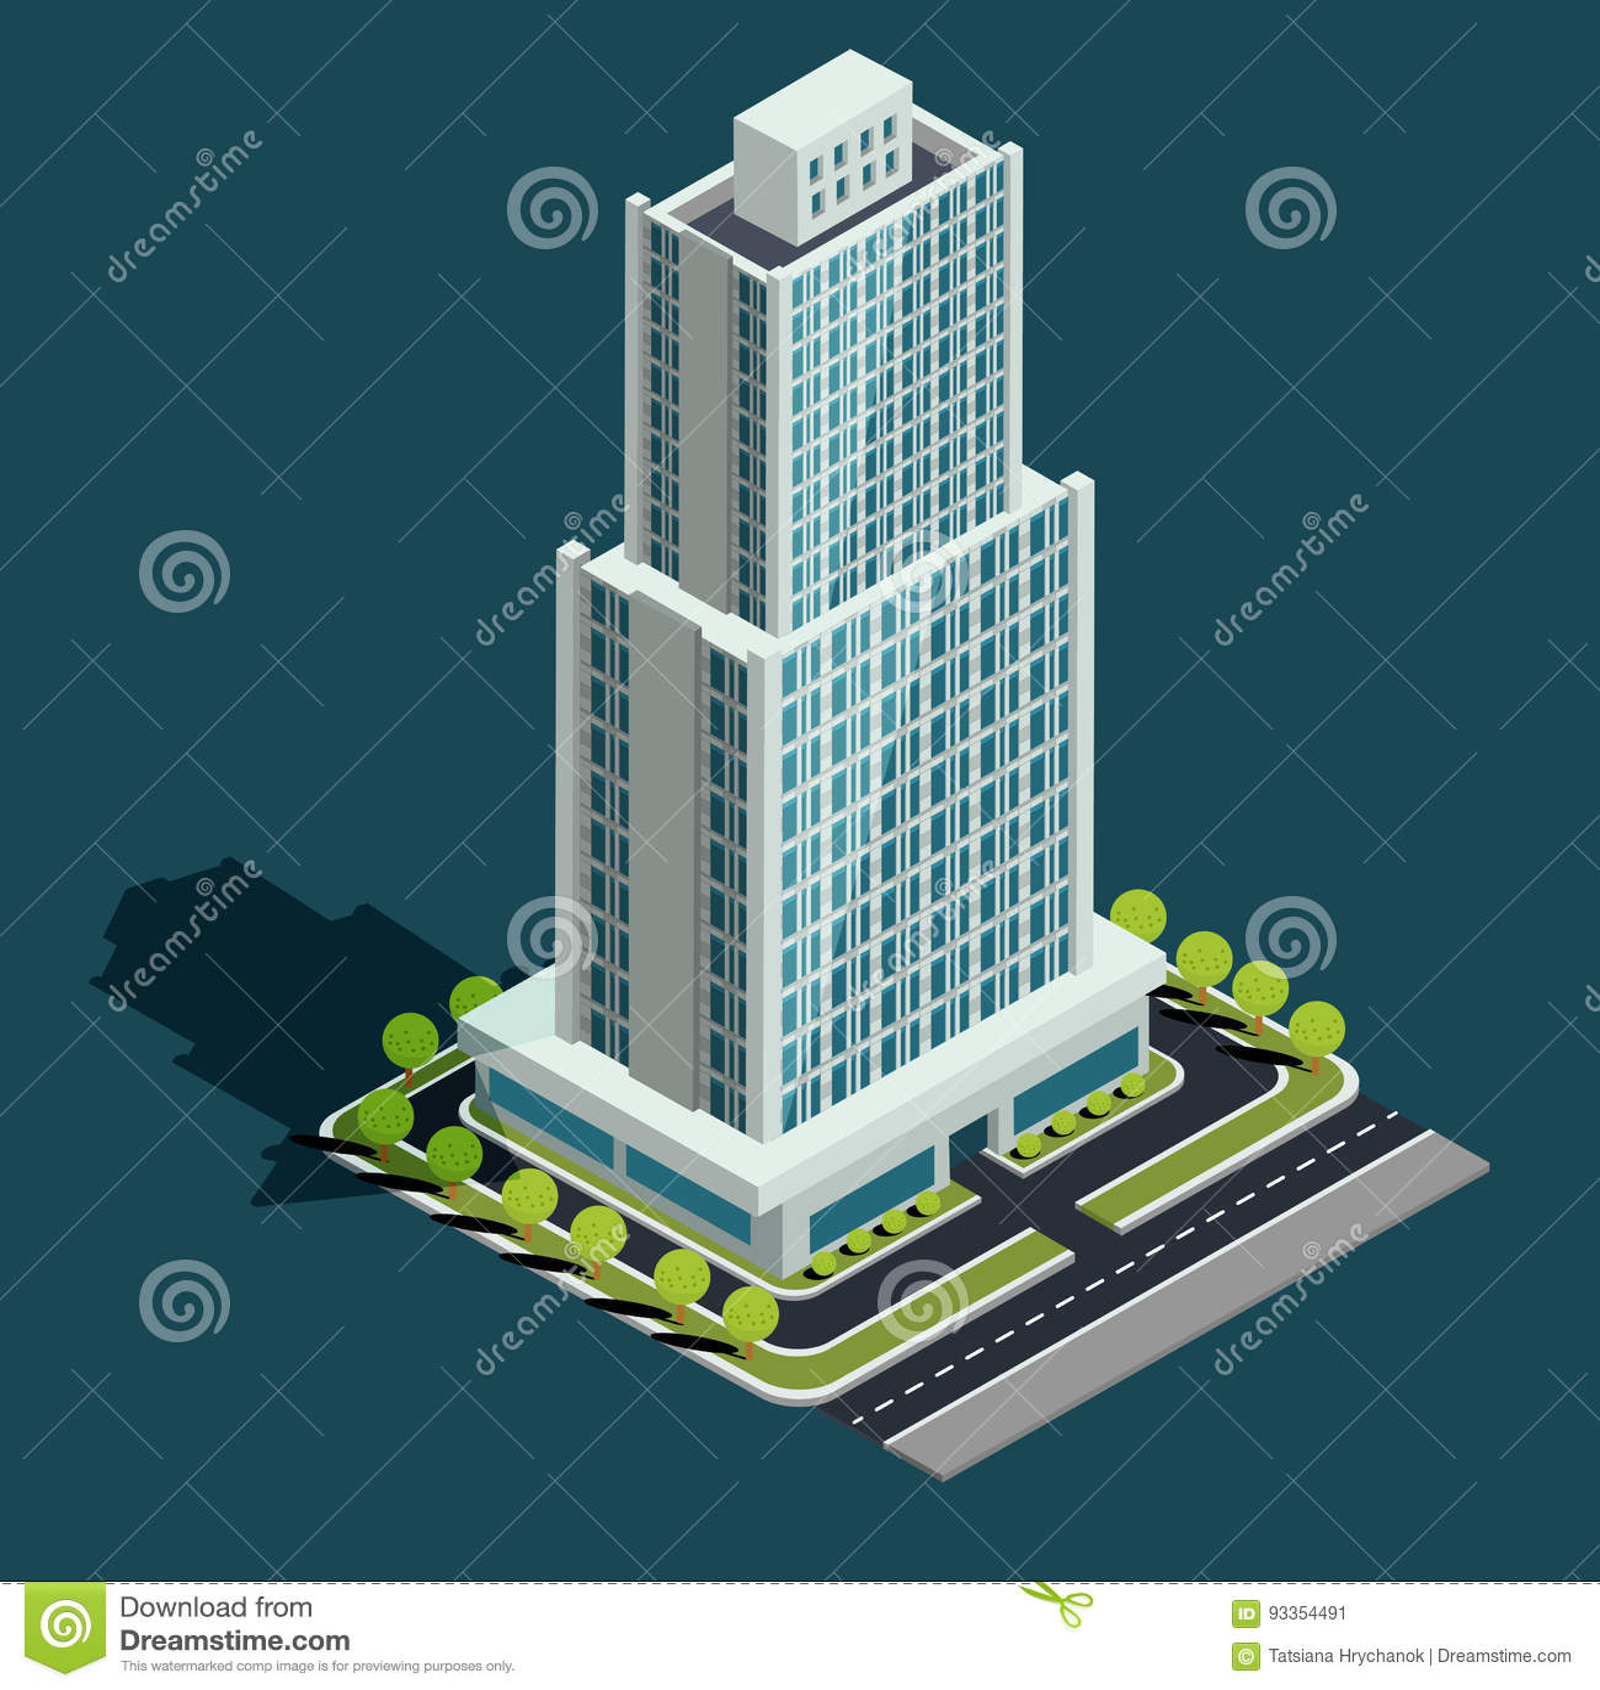 Vector Isometric 3D Illustration Of Modern Urban Building Stock